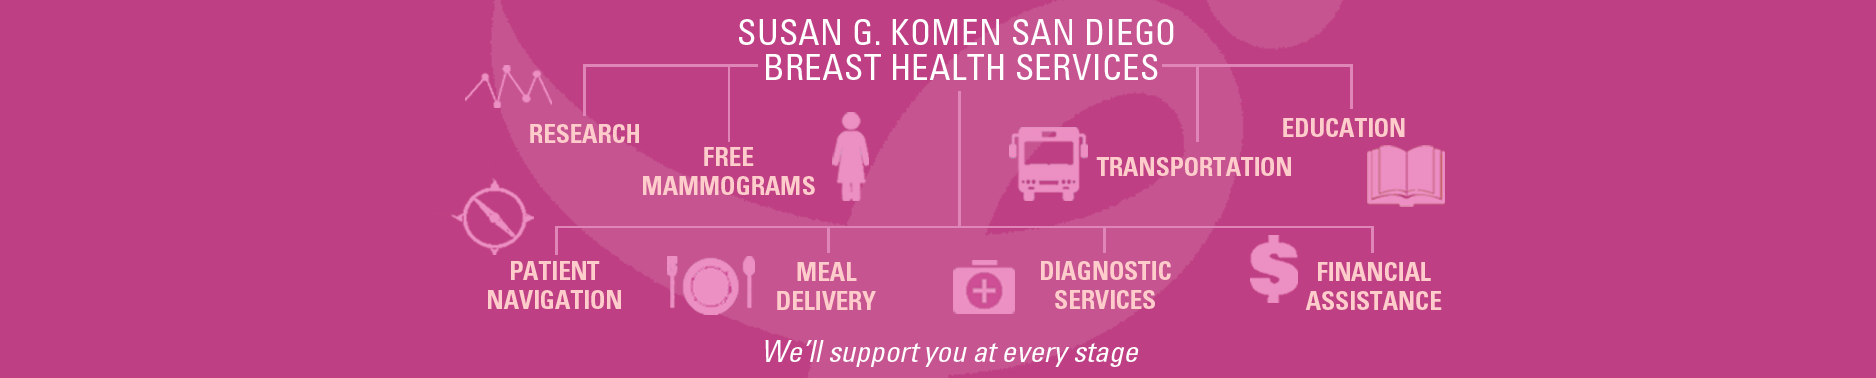 SGK_HealthServices_banner01102017